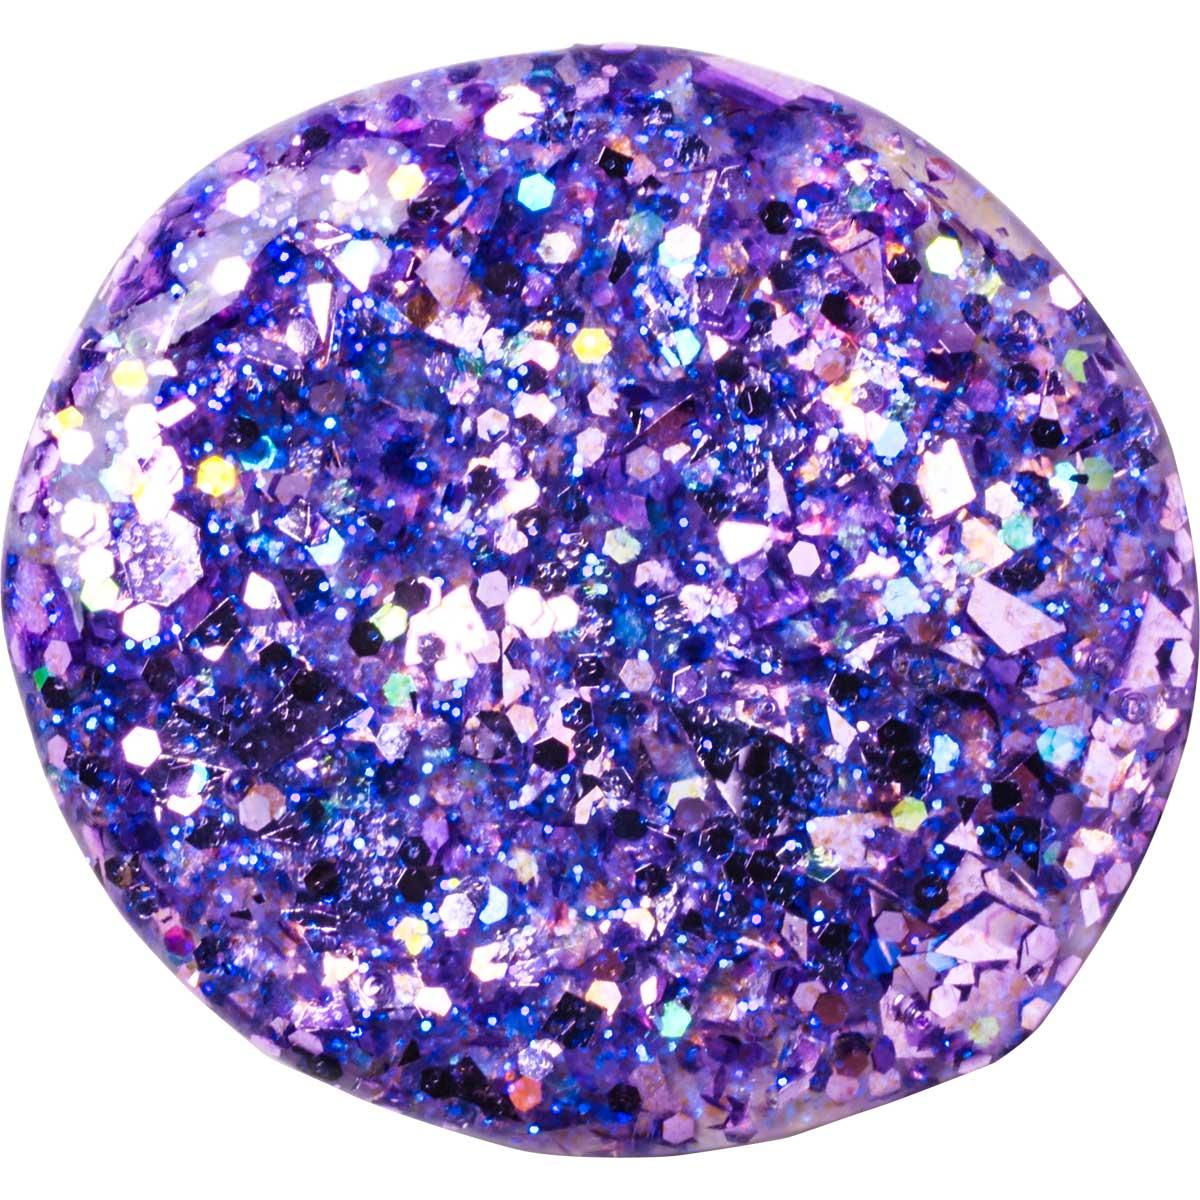 FolkArt ® Glitterific™ Acrylic Paint - Purple, 2 oz.